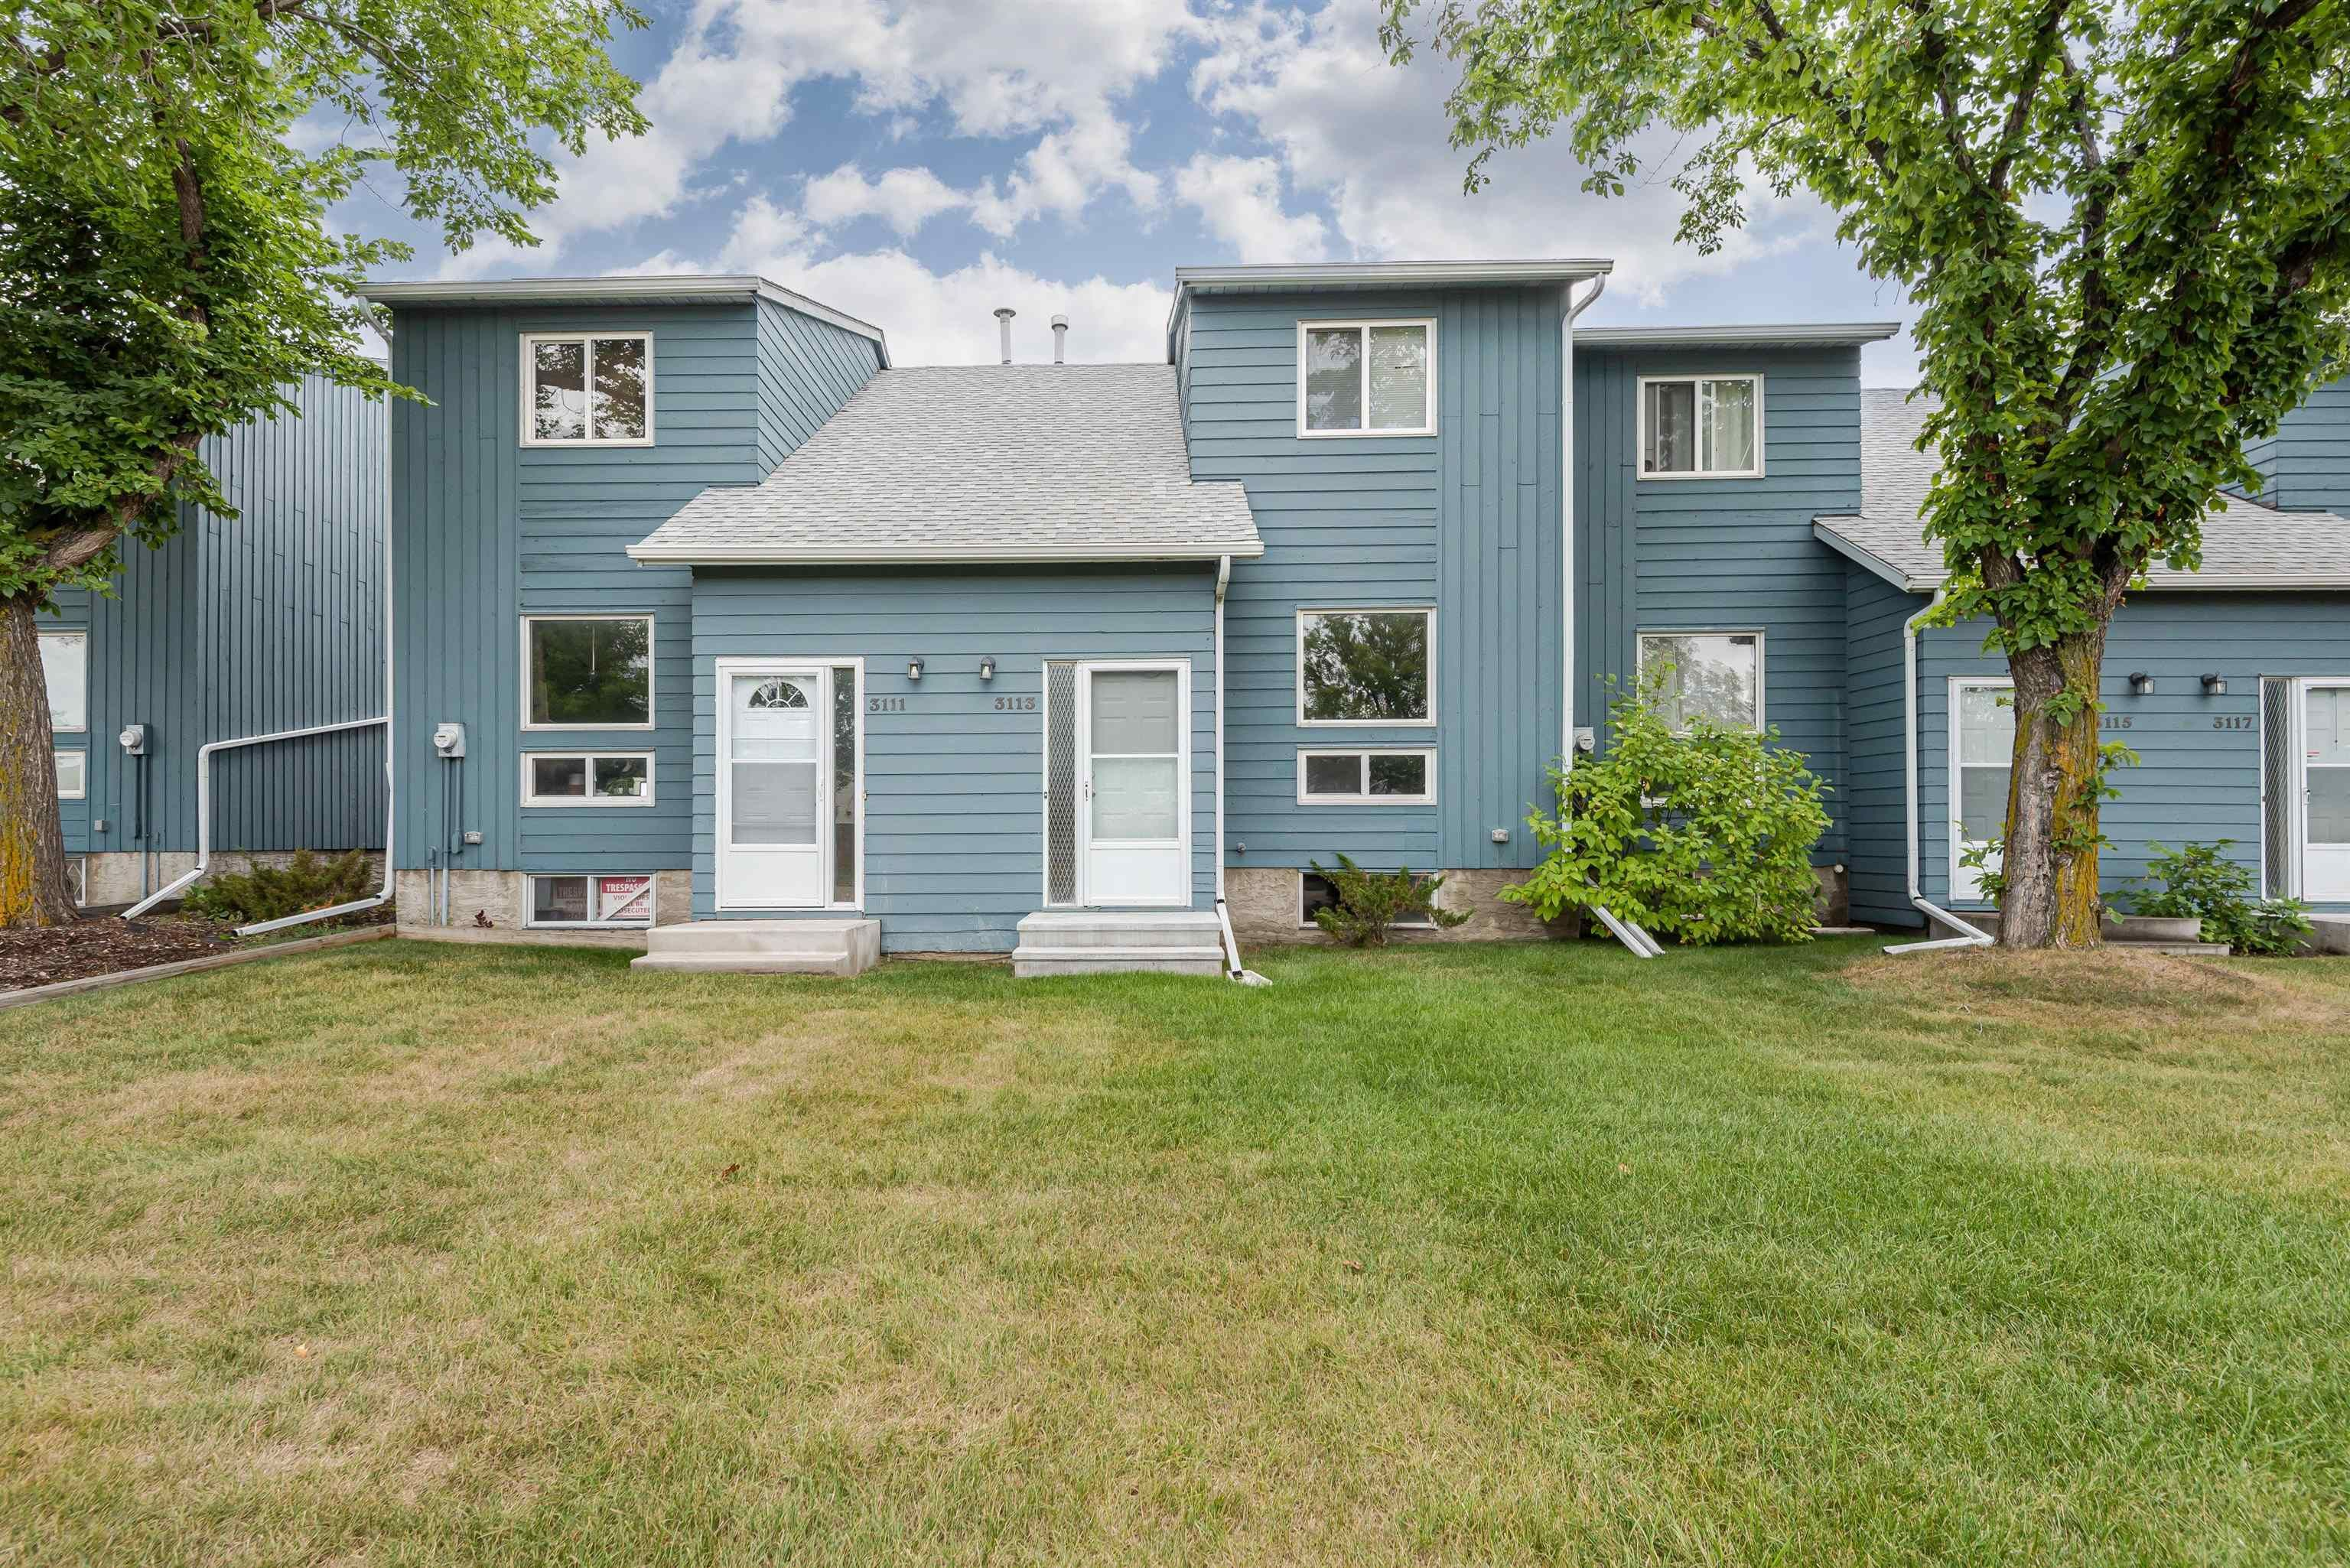 Main Photo: 3113 144 Avenue in Edmonton: Zone 35 Townhouse for sale : MLS®# E4260221